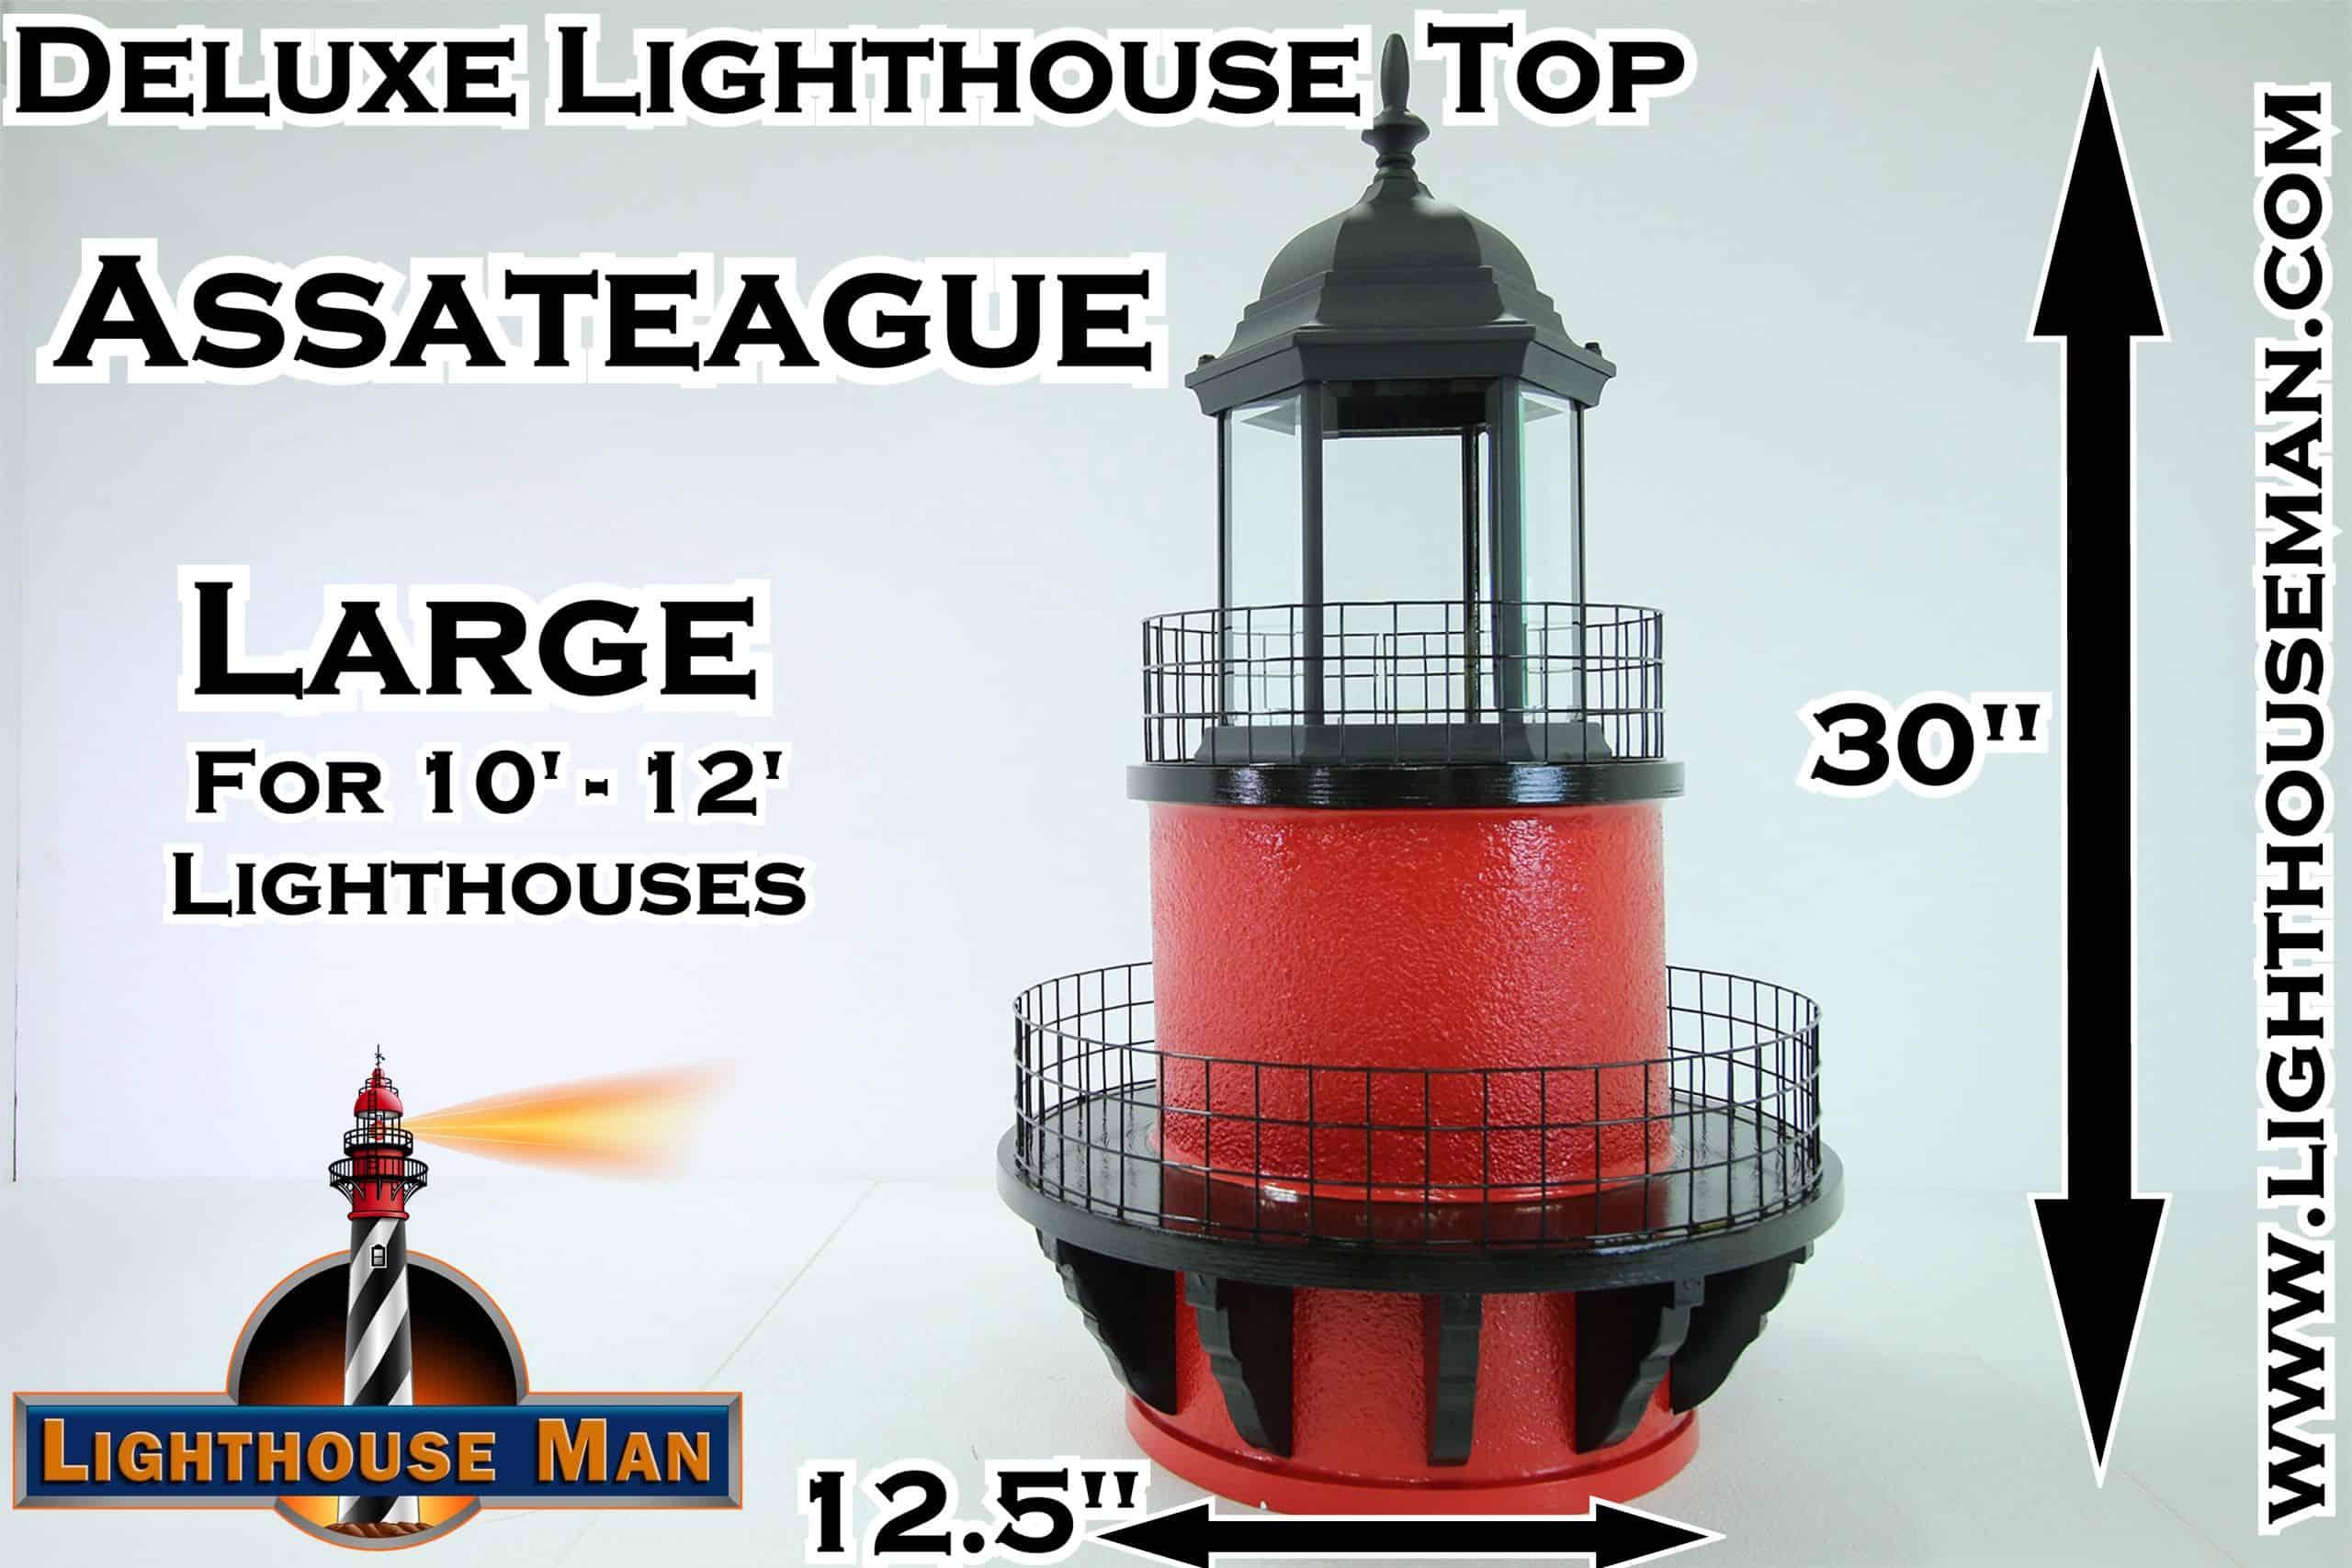 Deluxe Large Assateague Lighthouse Top